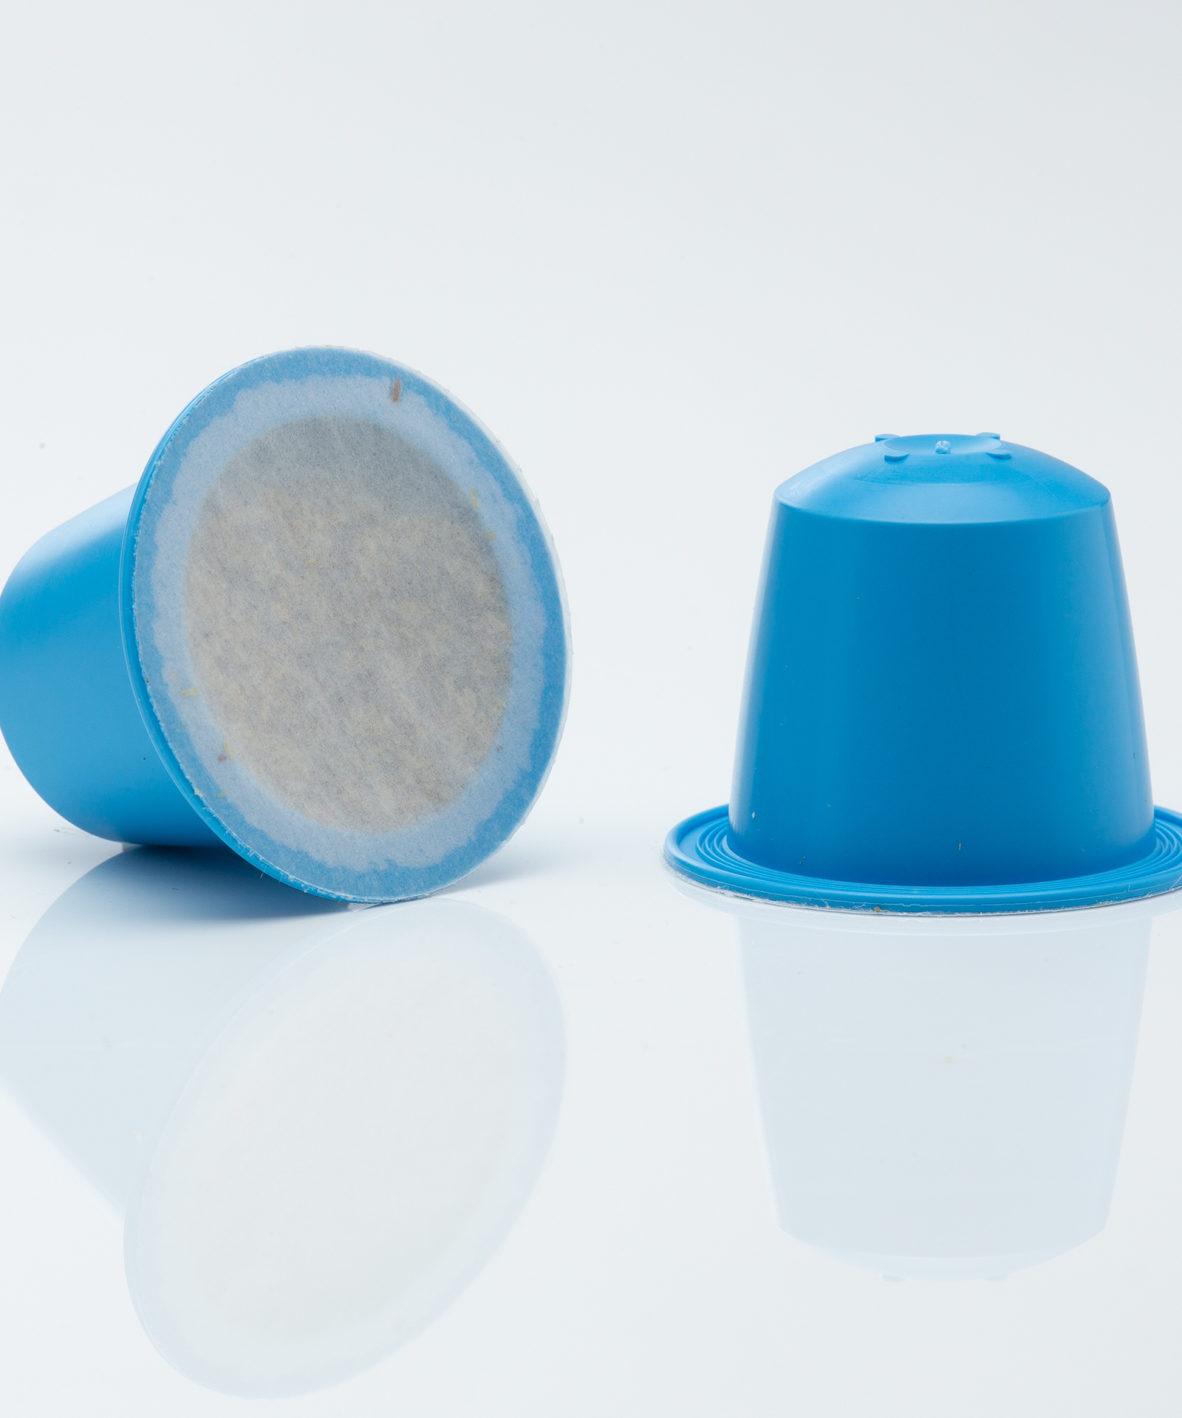 capsule infusion bio digest biodégradable compatible nespresso